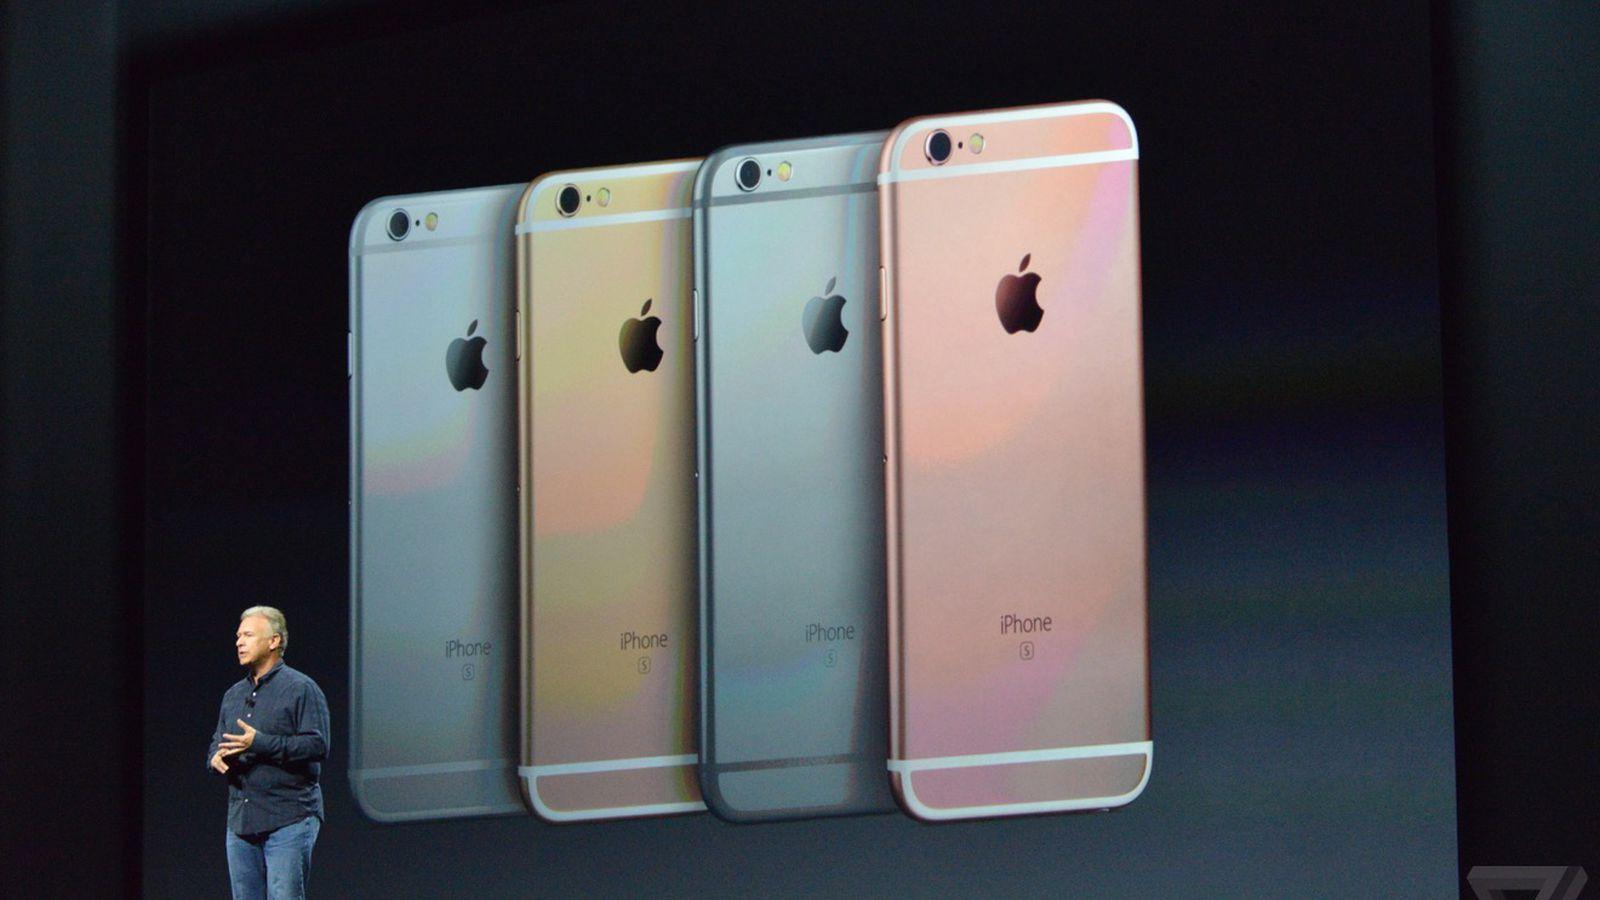 Klingeltöne Iphone 6s